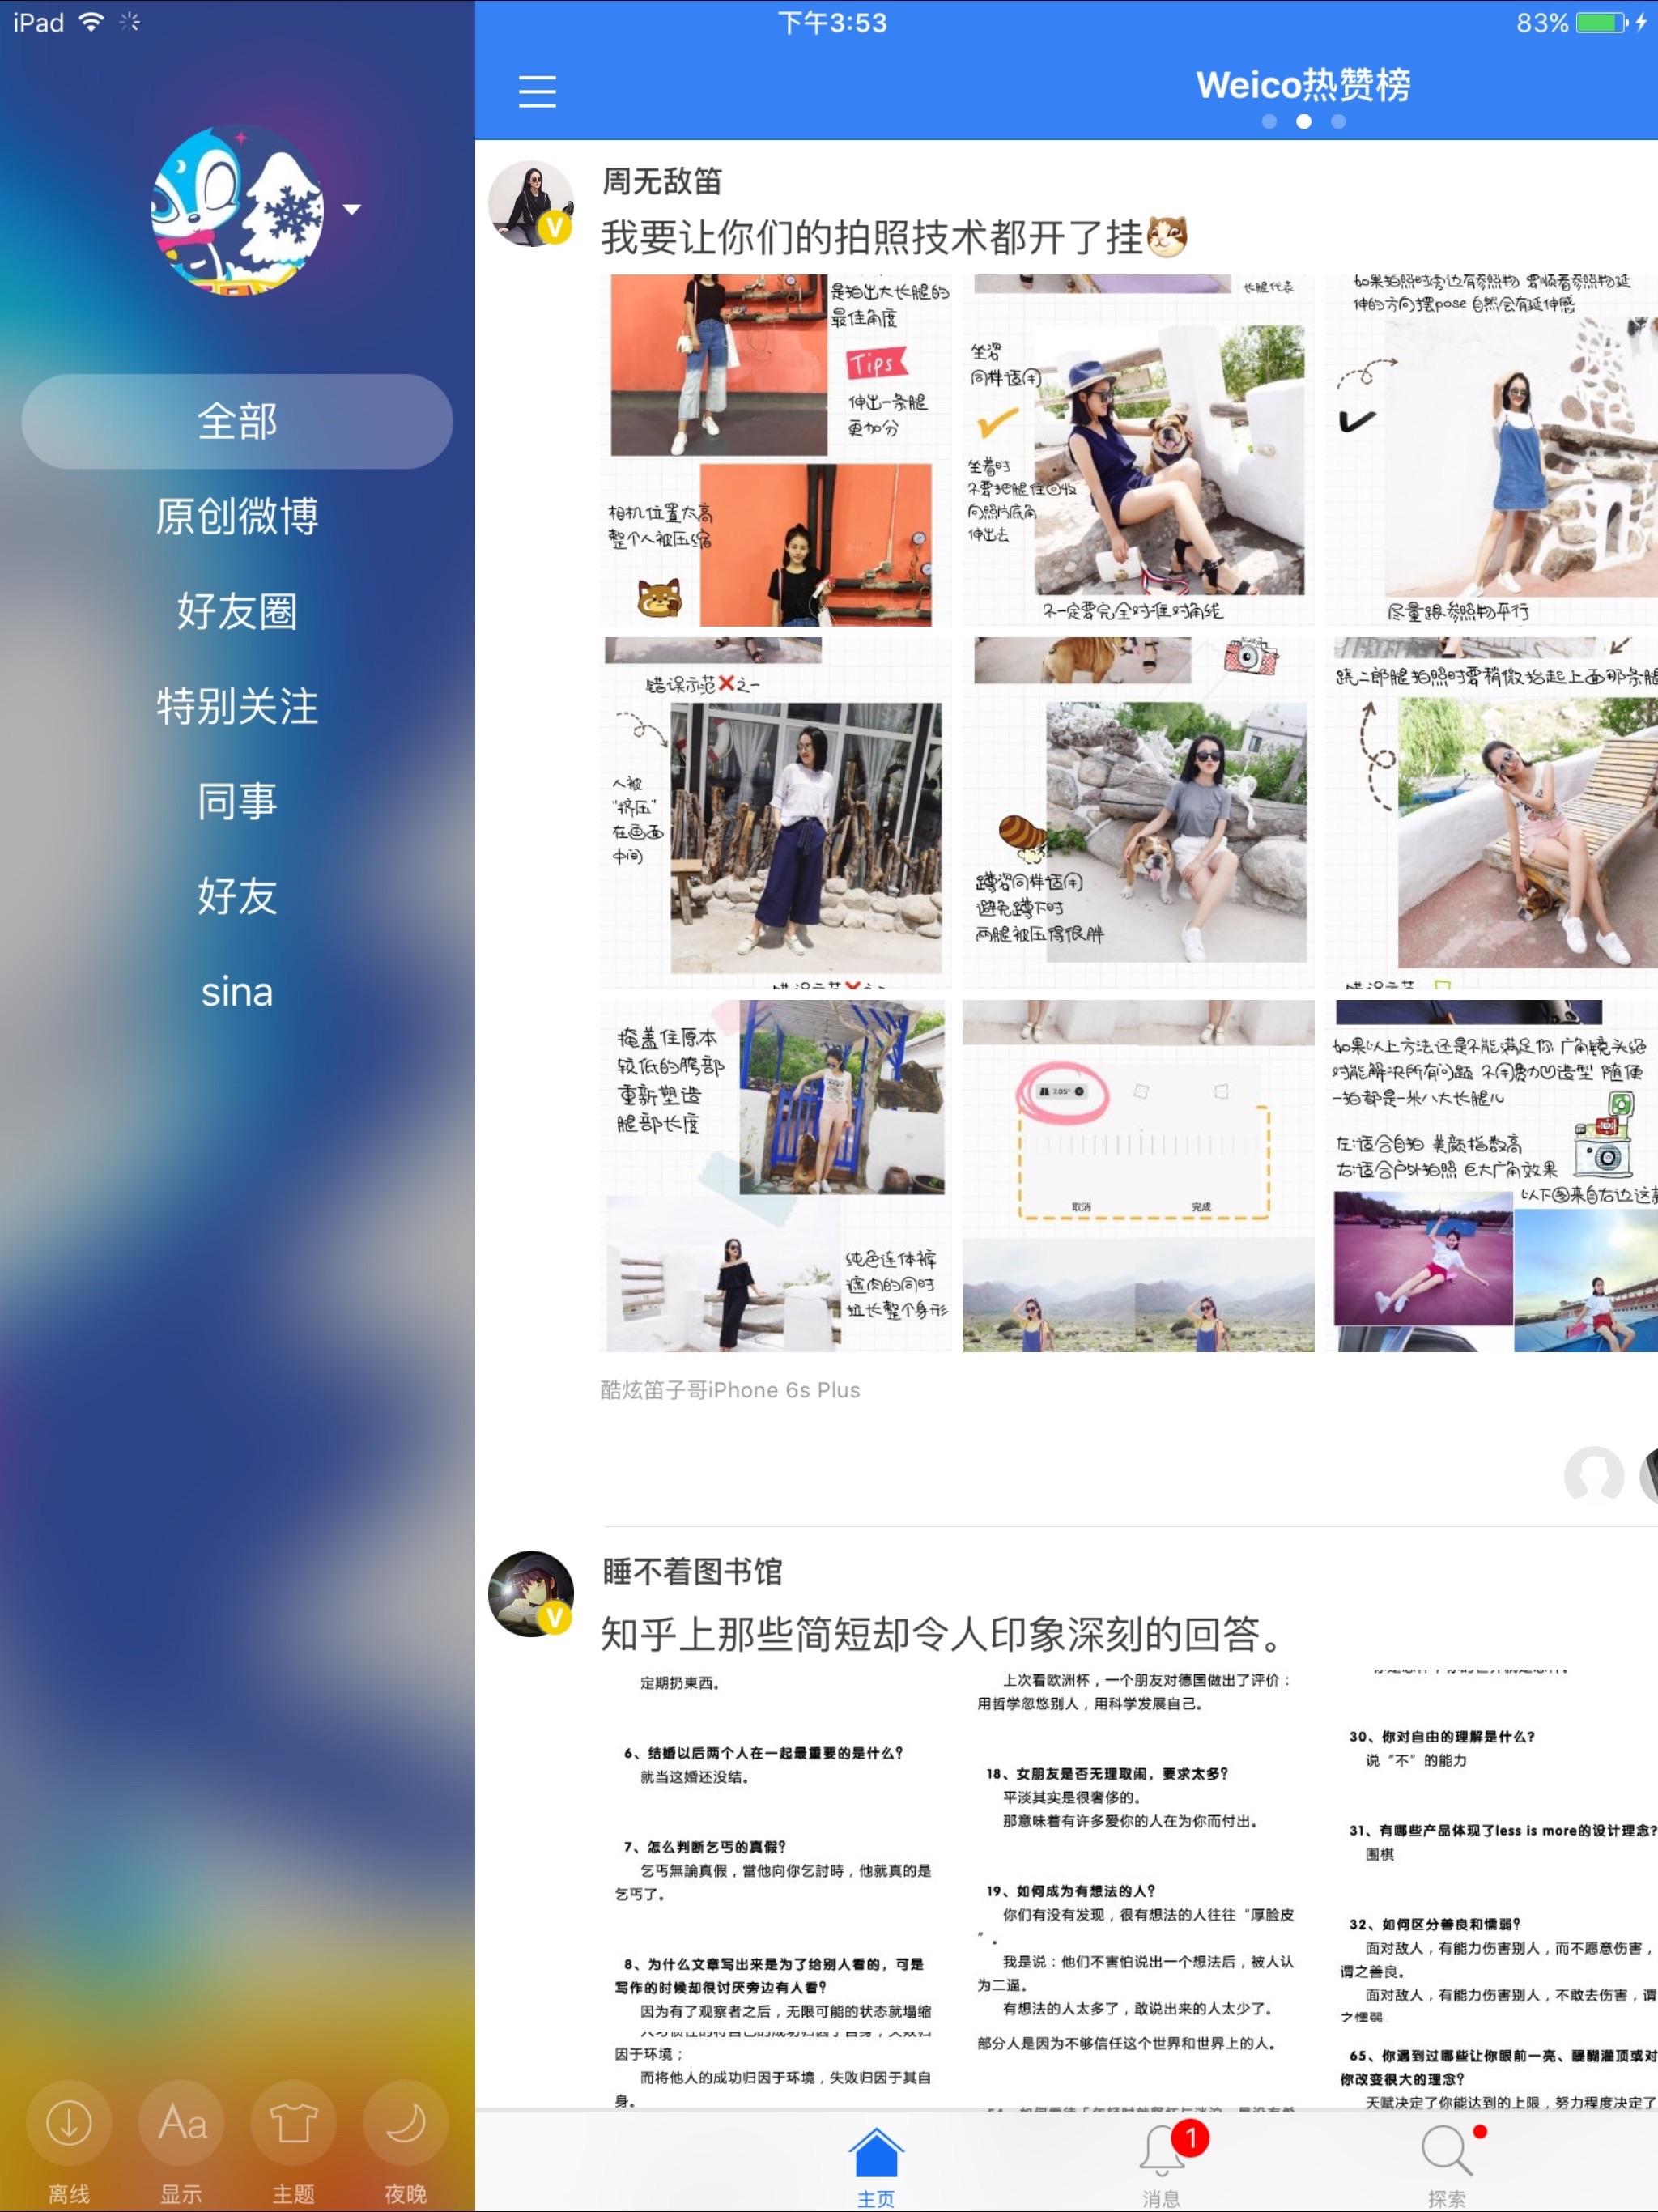 Weico HD 微博客户端 Screenshot